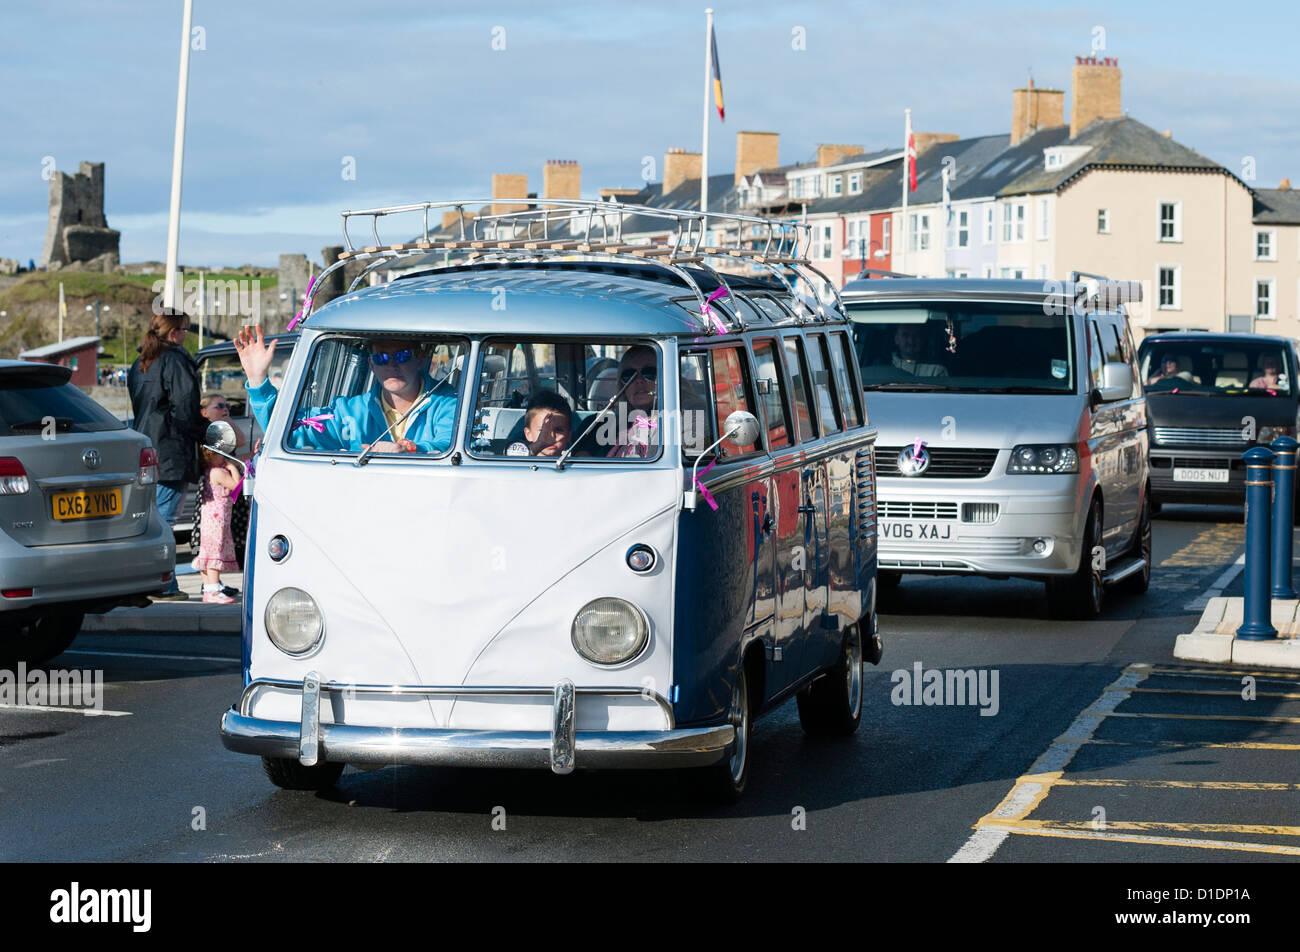 A classic VW Volkswagen Samba campervan, driving along the promenade at  Aberystwyth Wales UK - Stock Image